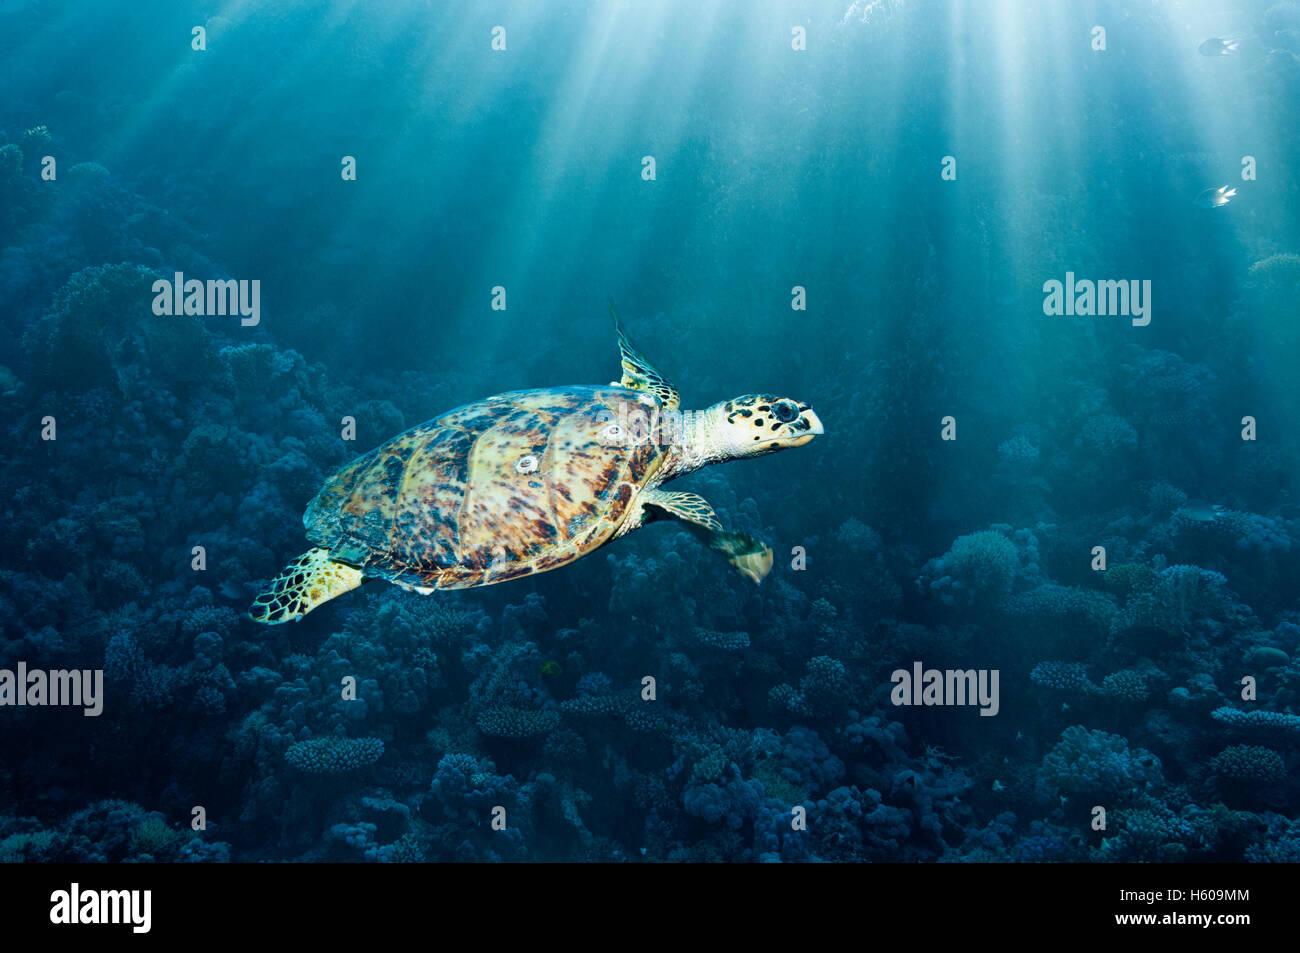 Hawksbill turtle (Eremochelys imbricata) with rays of sunshine.  Egypt, Red Sea. - Stock Image